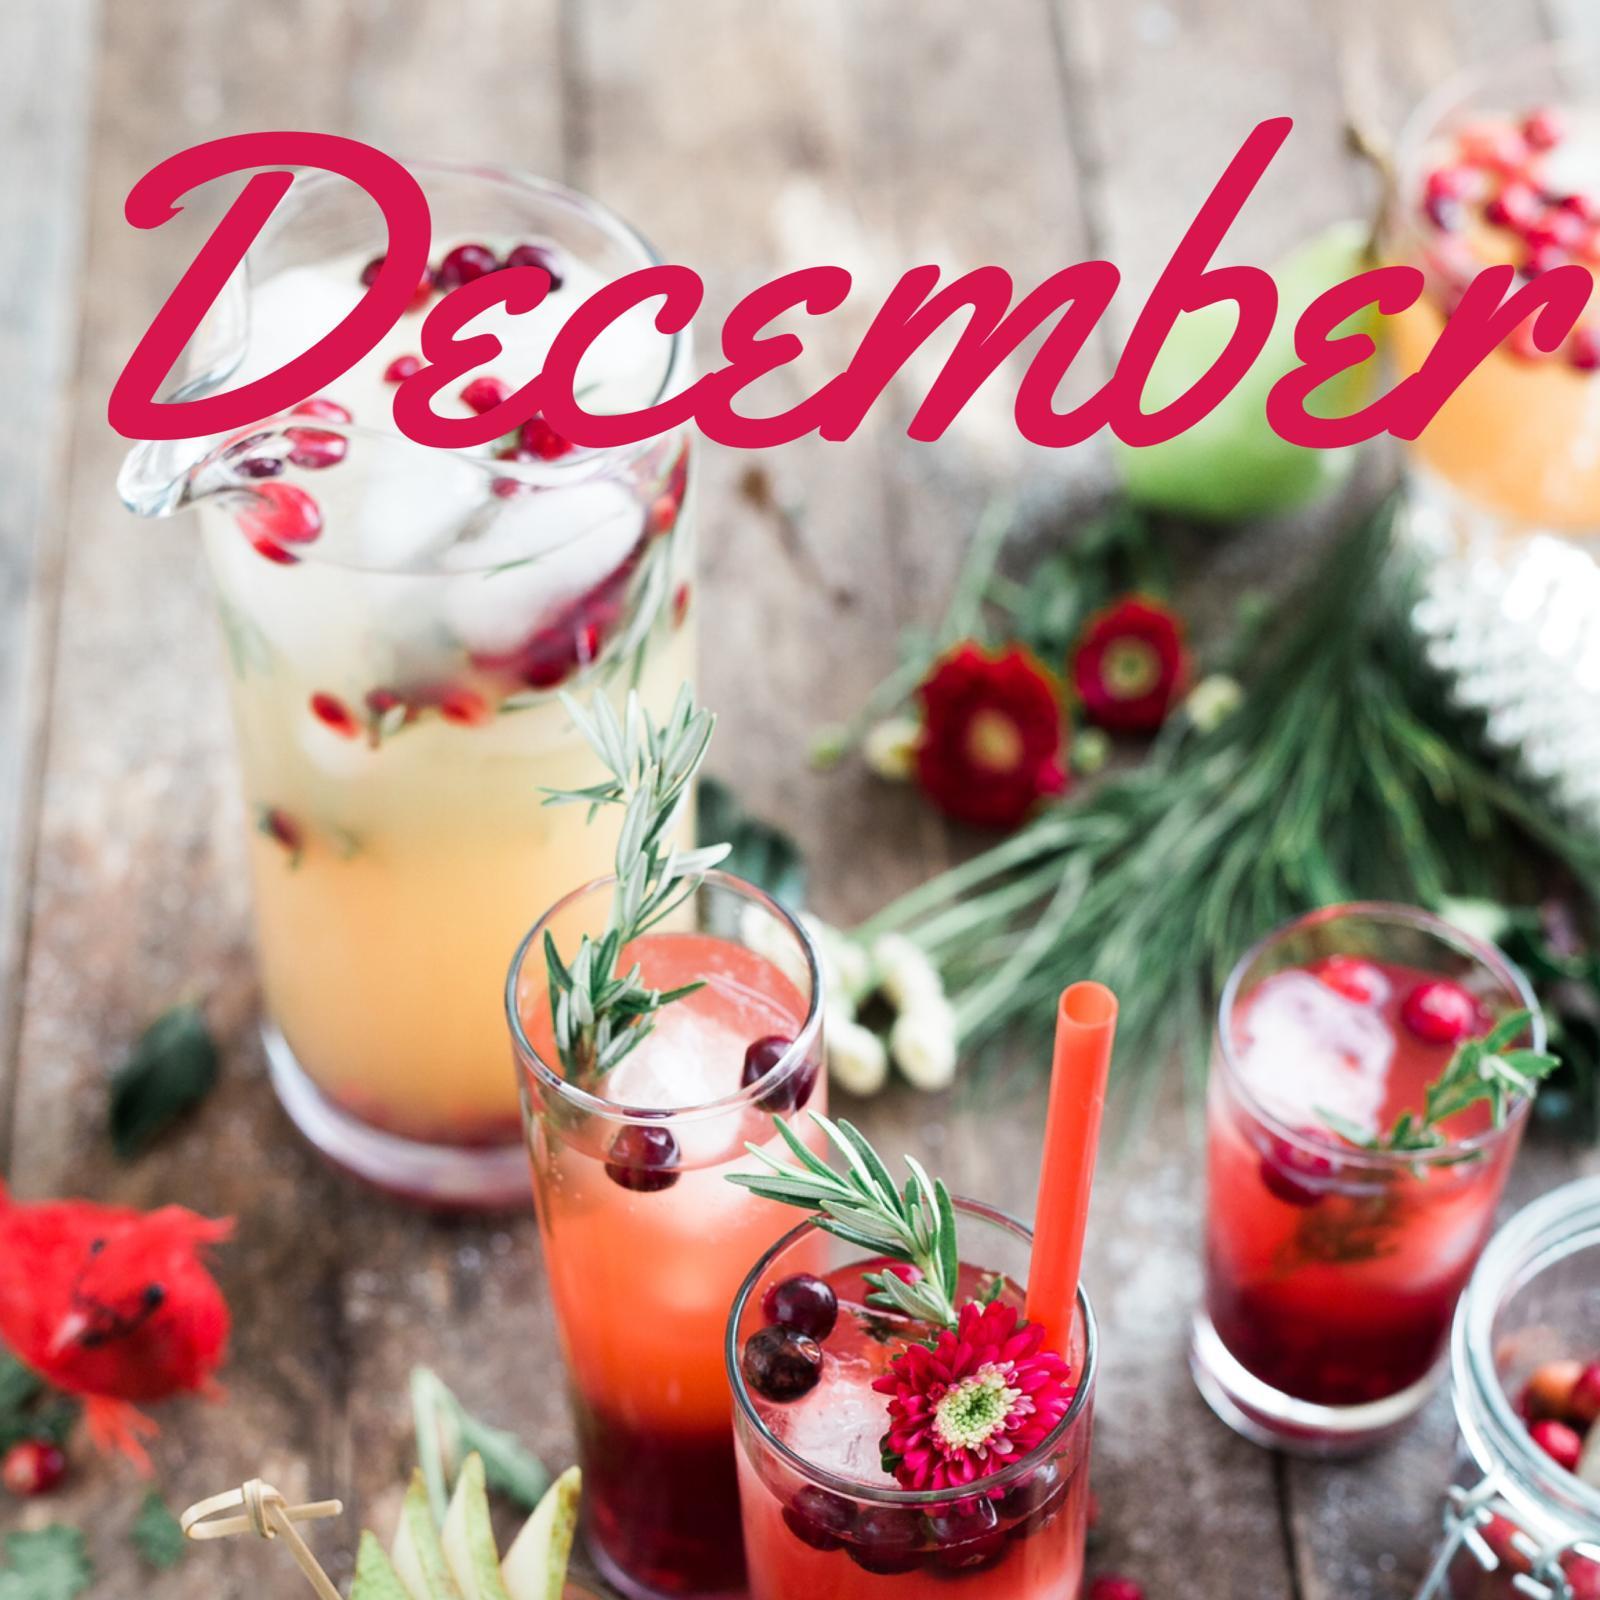 Dec 2020 meeting: Christmas crafts & cocktails